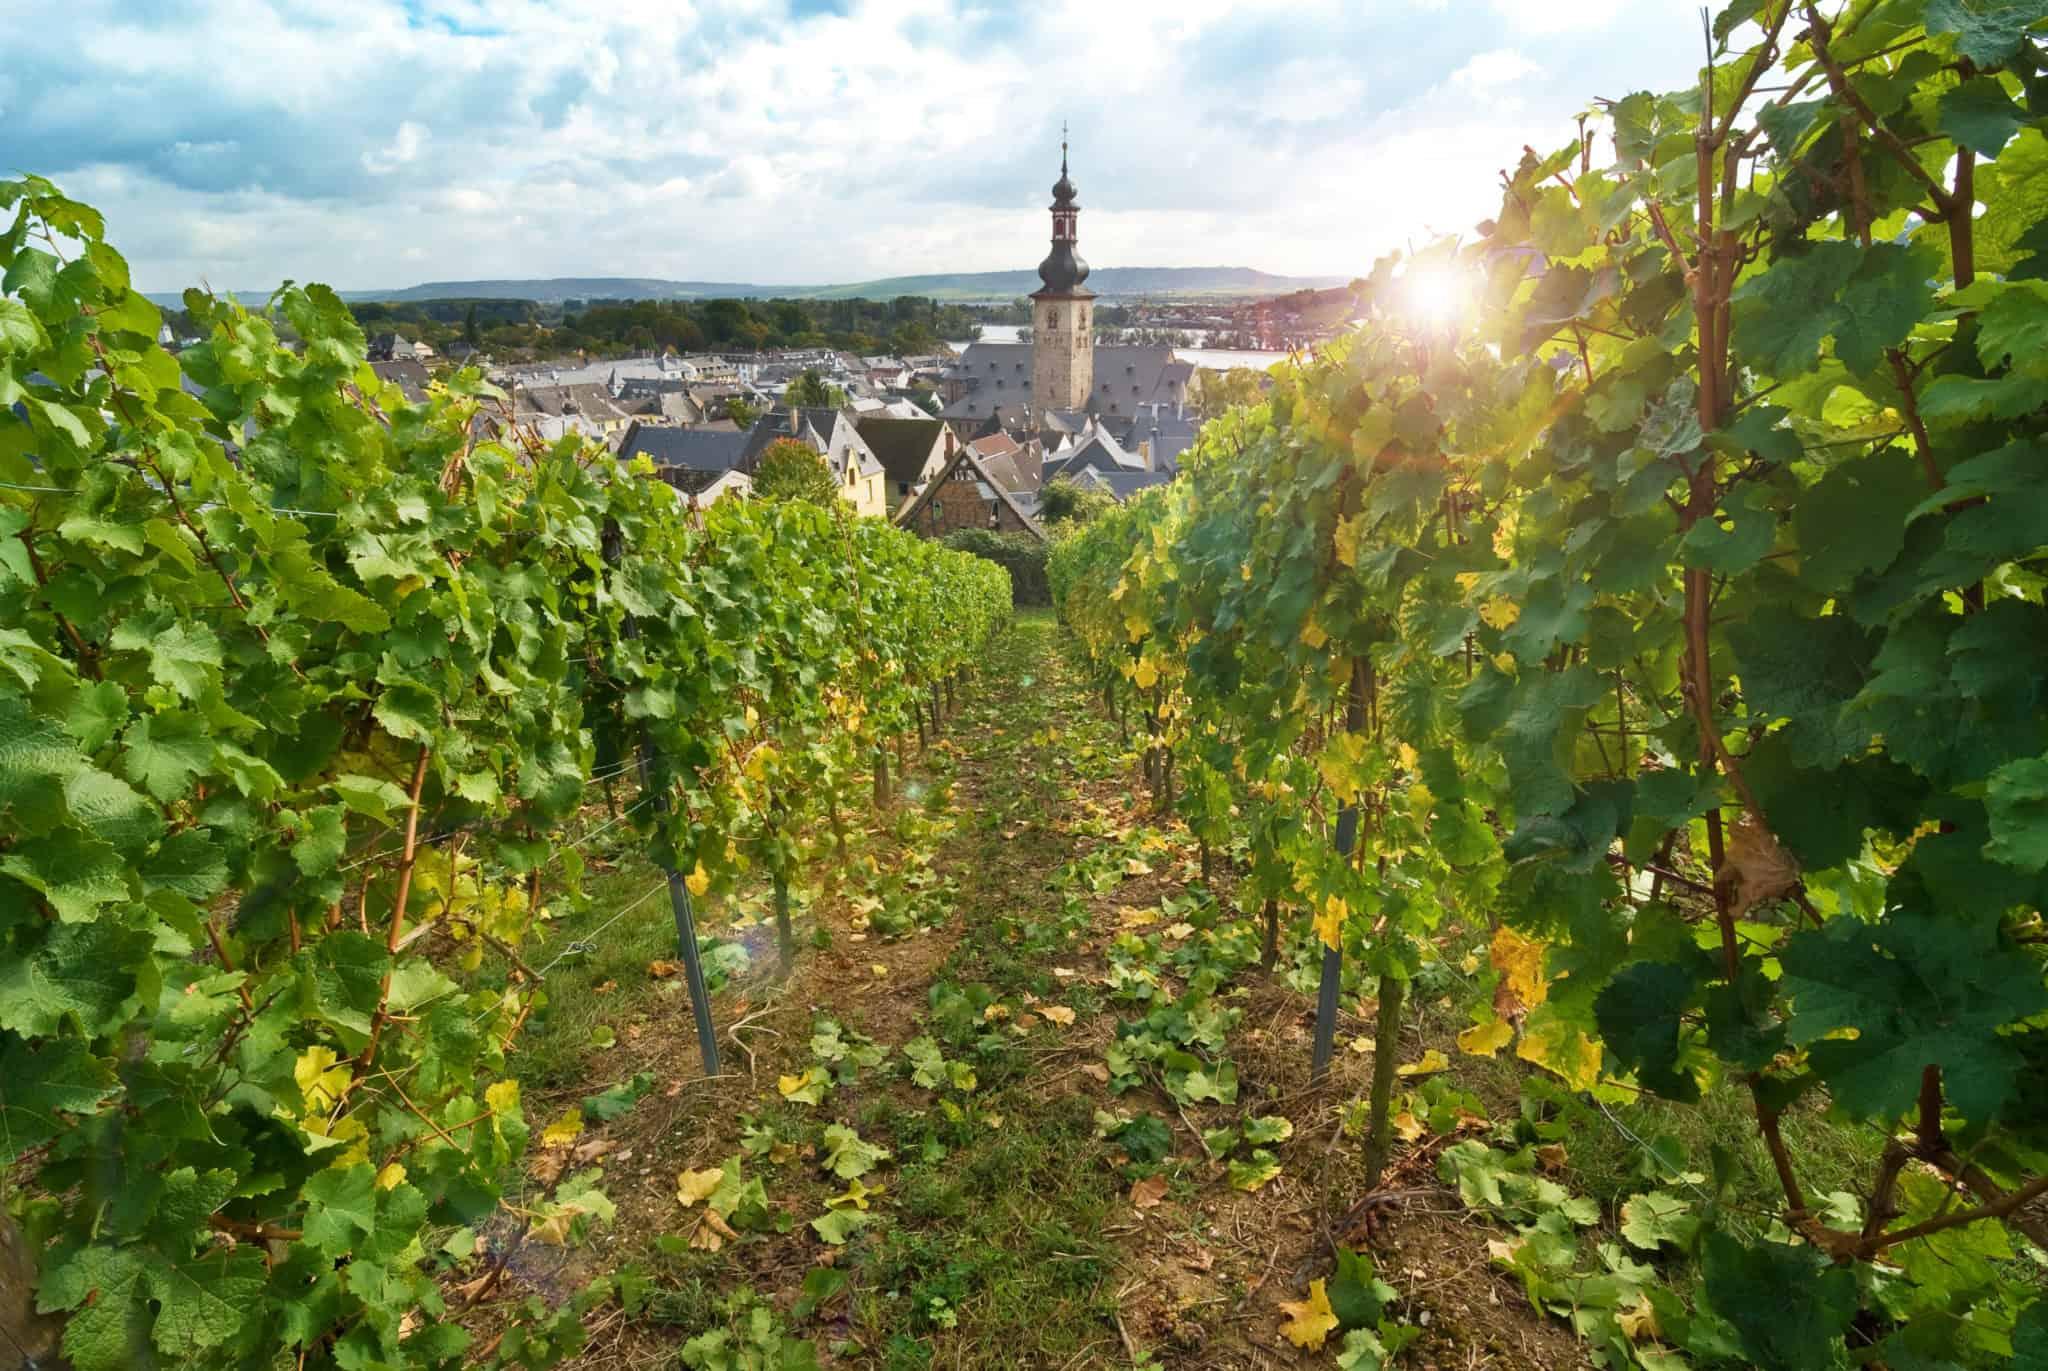 Auf Weinreise im Rheingau